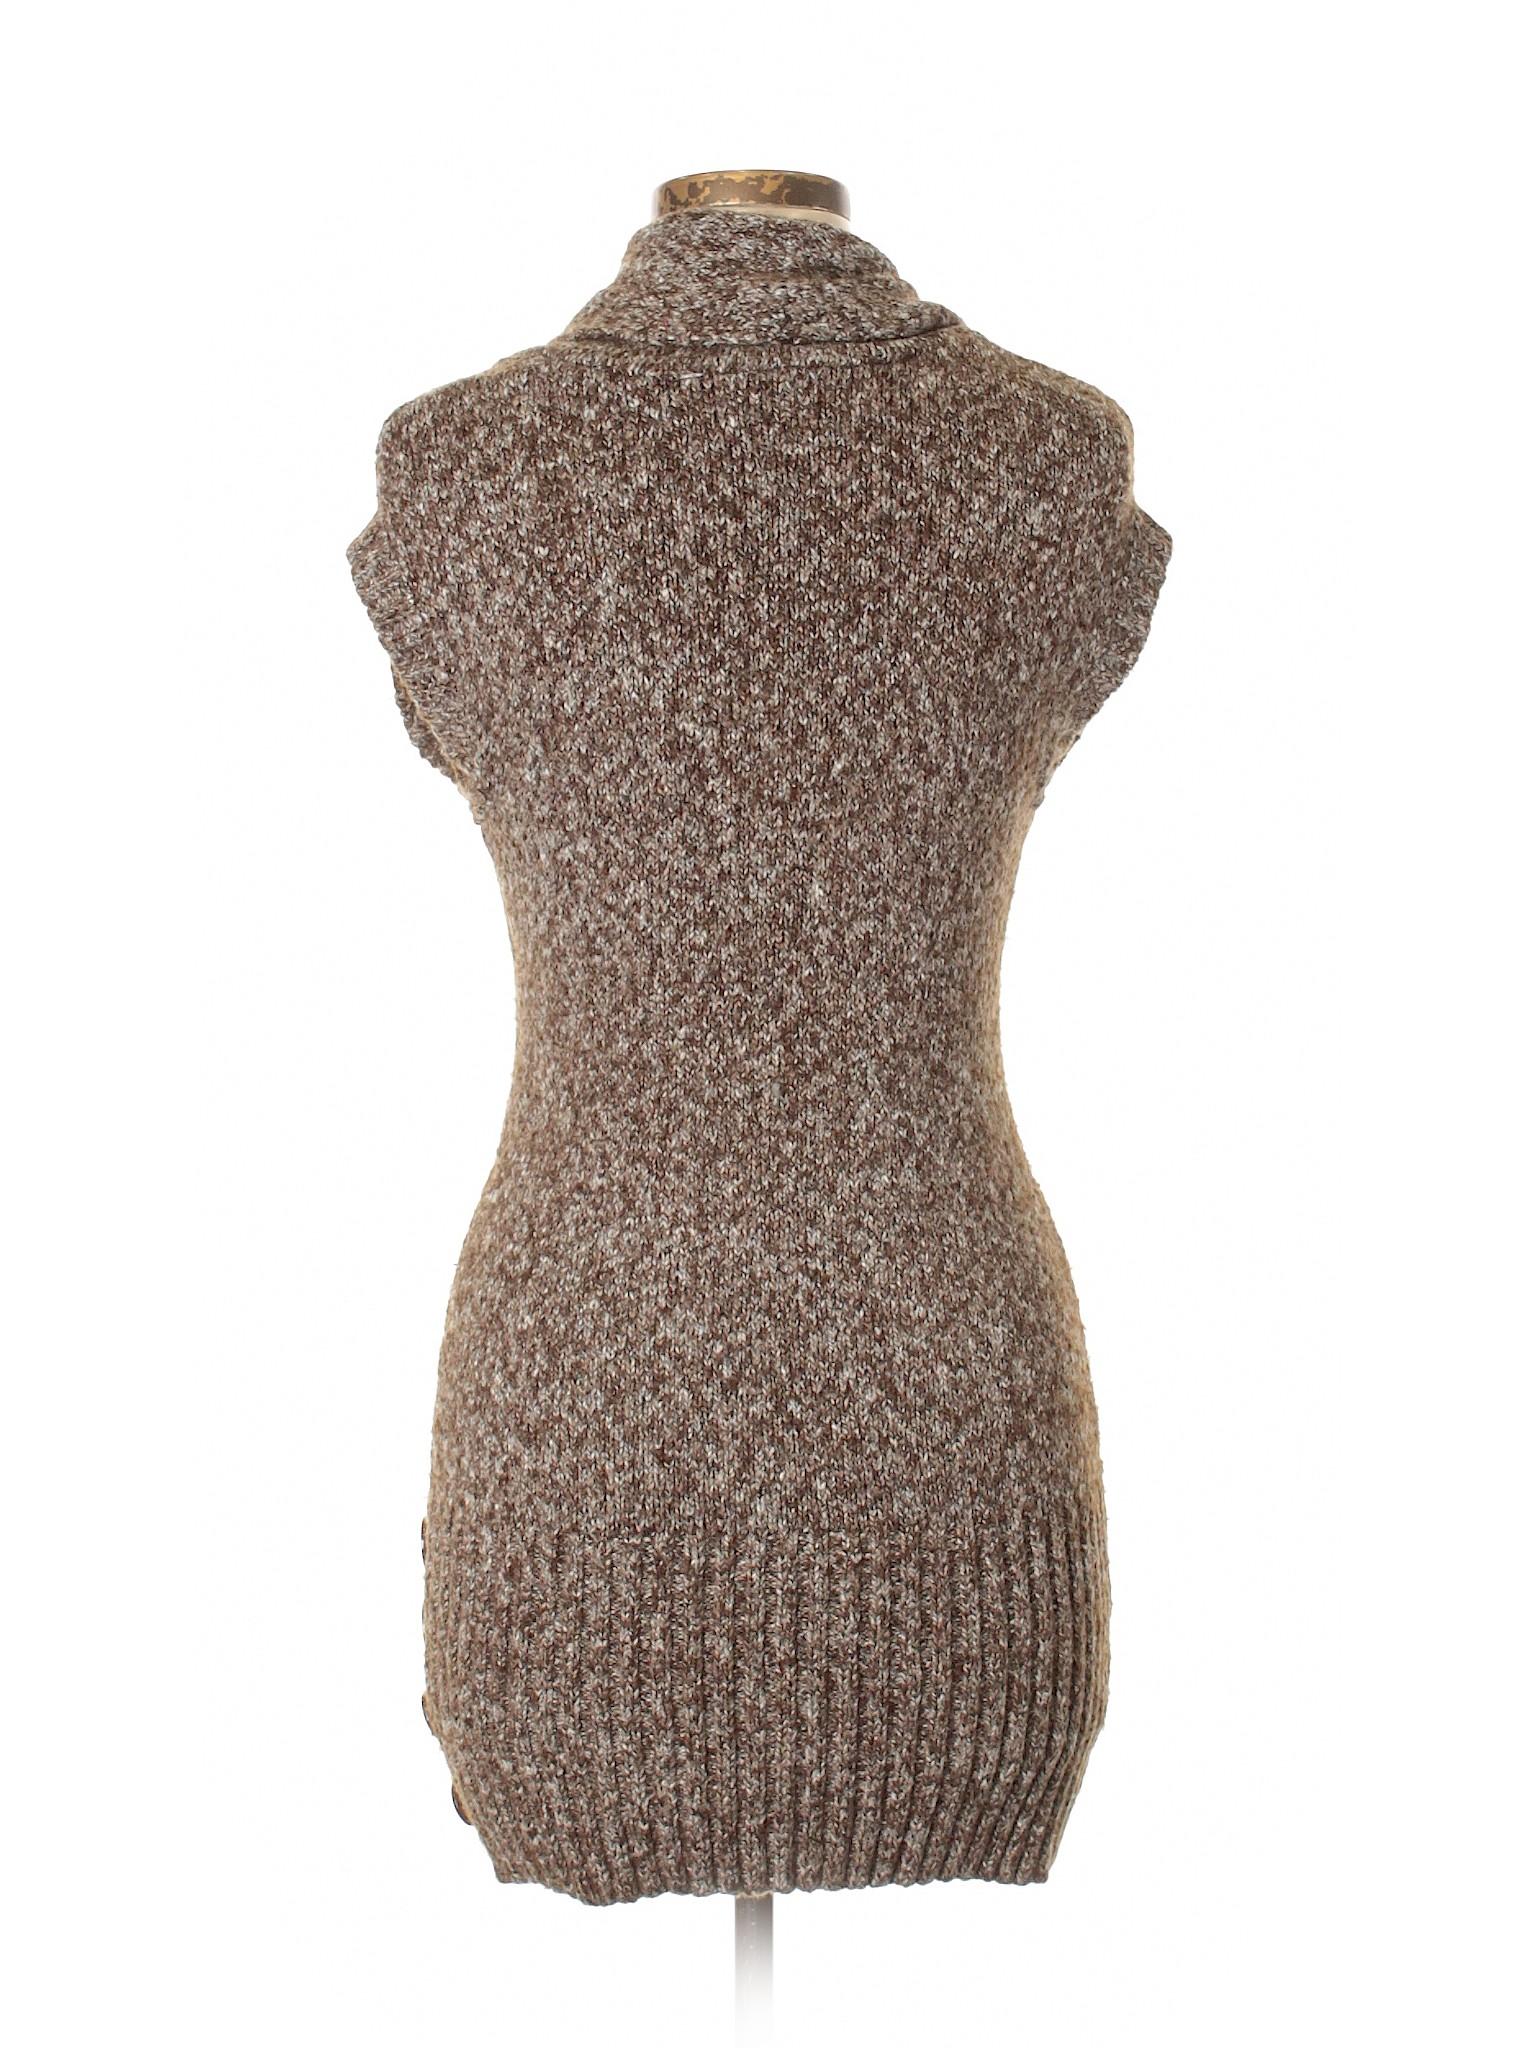 JJ Casual winter Boutique Dress Basics 8pqwga5x